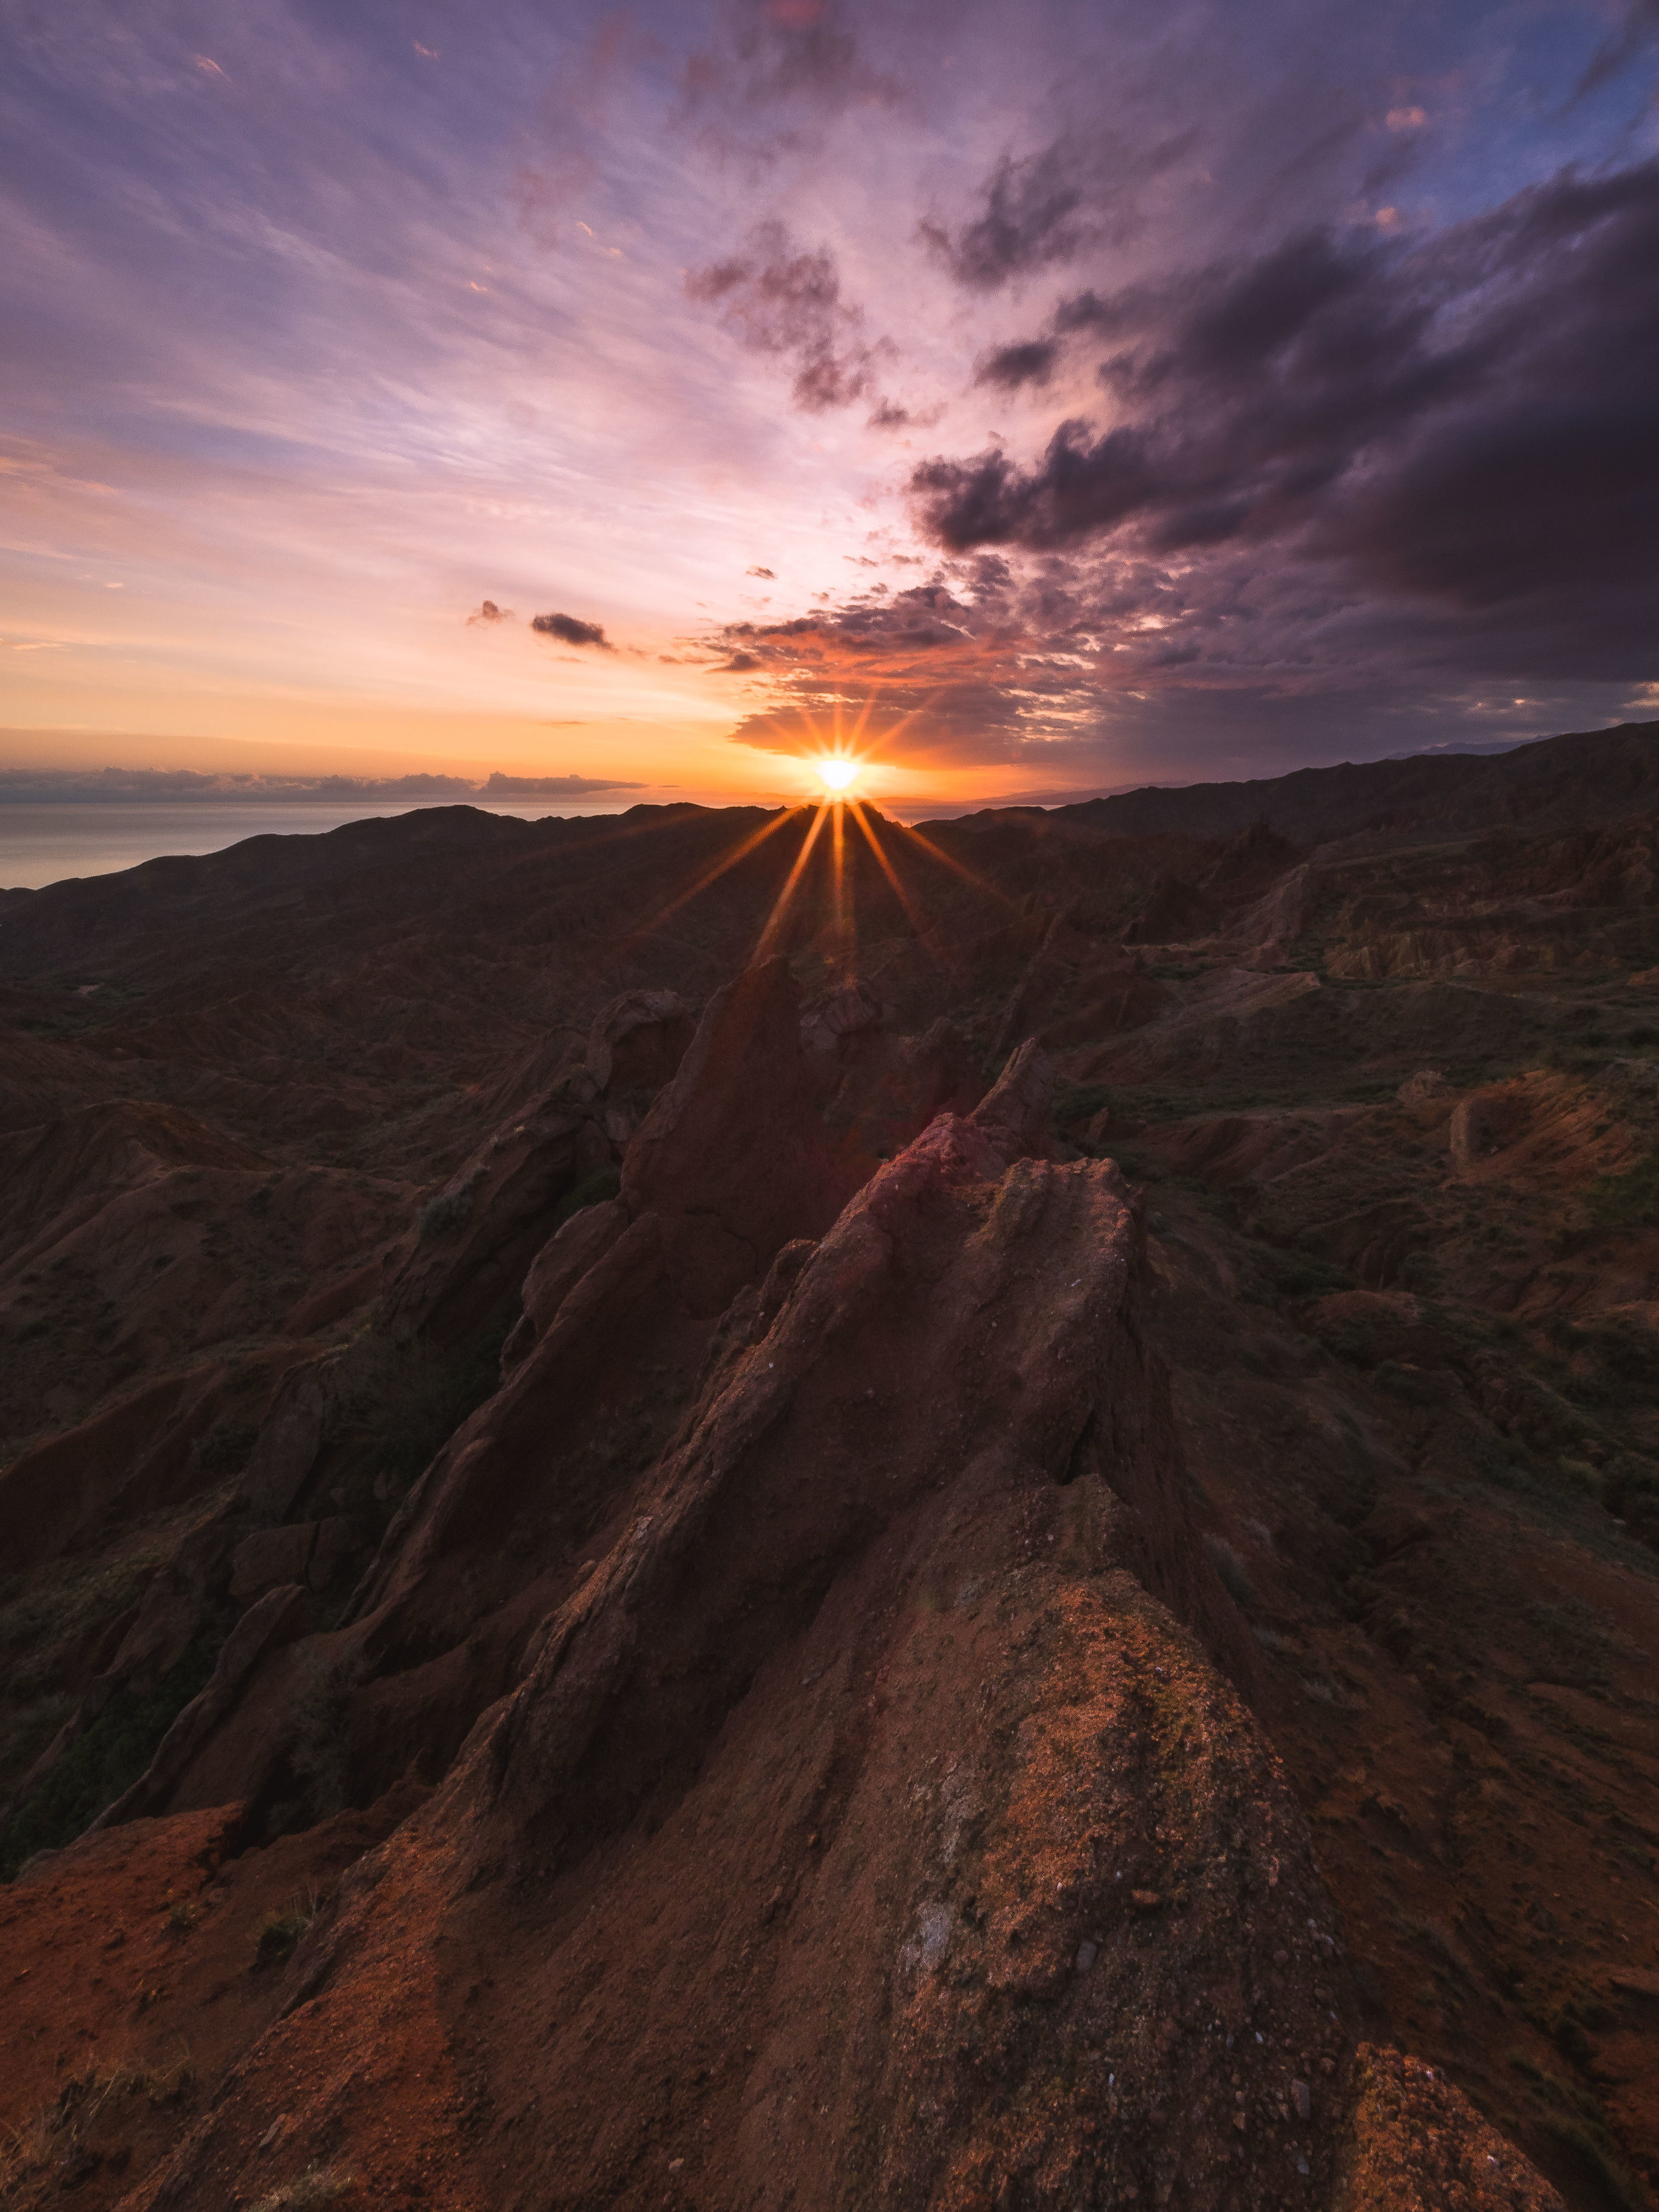 Skazka Stars - Sun flare over Skazka Canyon aka Fairytale Canyon. Photo: Matt Horspool.